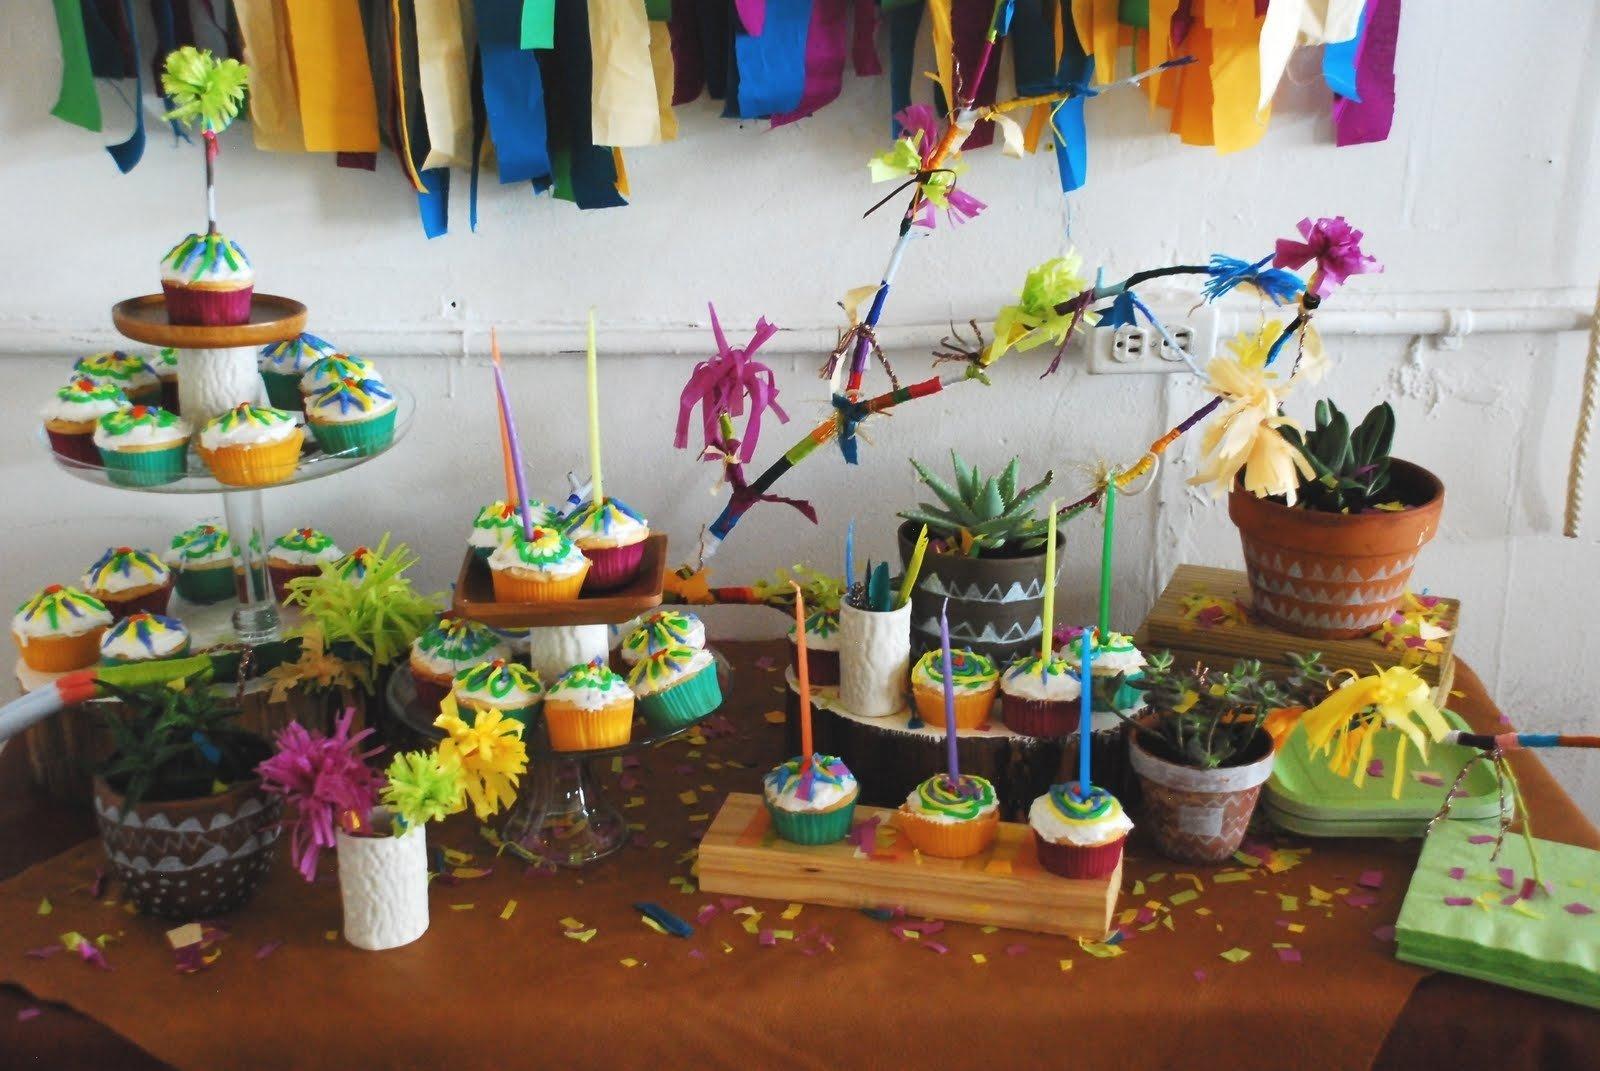 10 Famous 13 Year Old Boy Birthday Party Ideas themes birthday good ideas for a 13 year old birthday party boy 2 2021